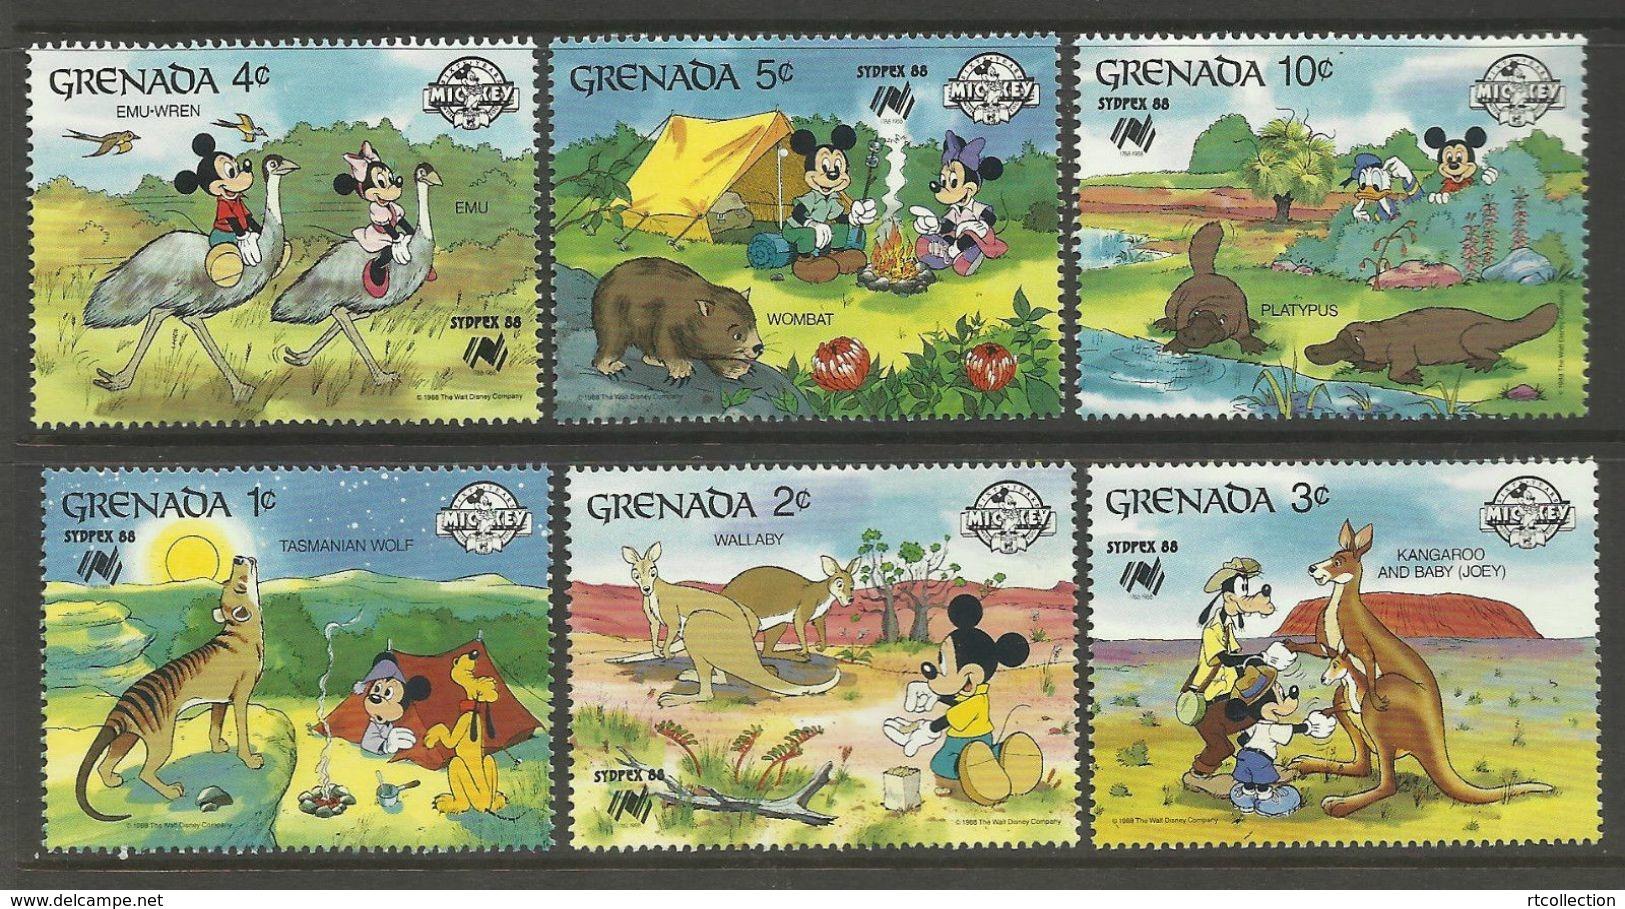 Grenada 1988 Sydpex Disney Mickey Cartoon Animation Animals Fauna Kangaroo Birds Ostriches Stamps (12) MNH SG 998-1005 - Disney